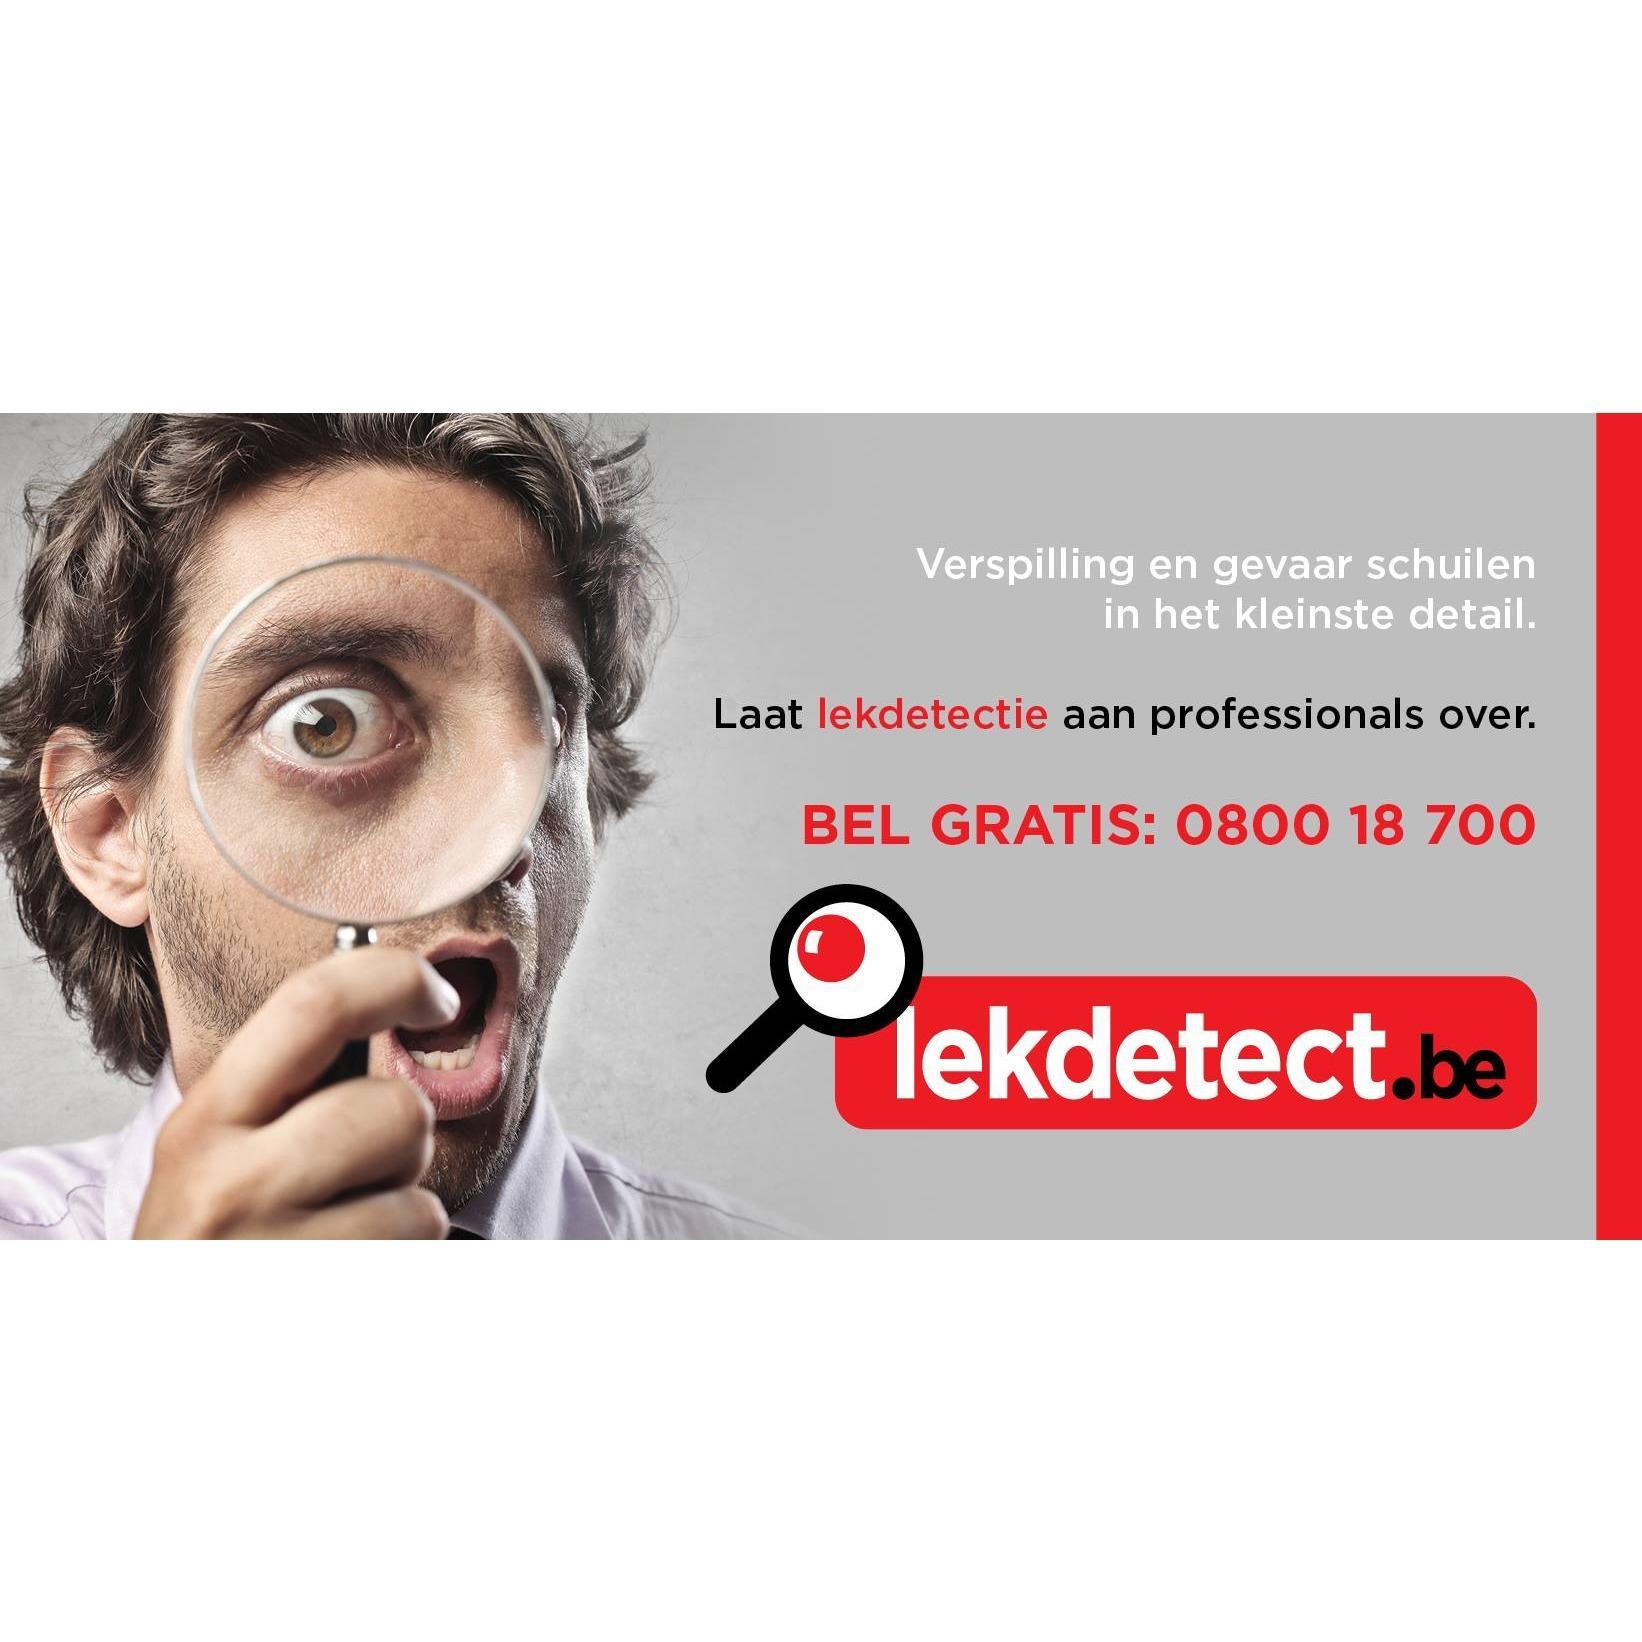 Lekdetect.be